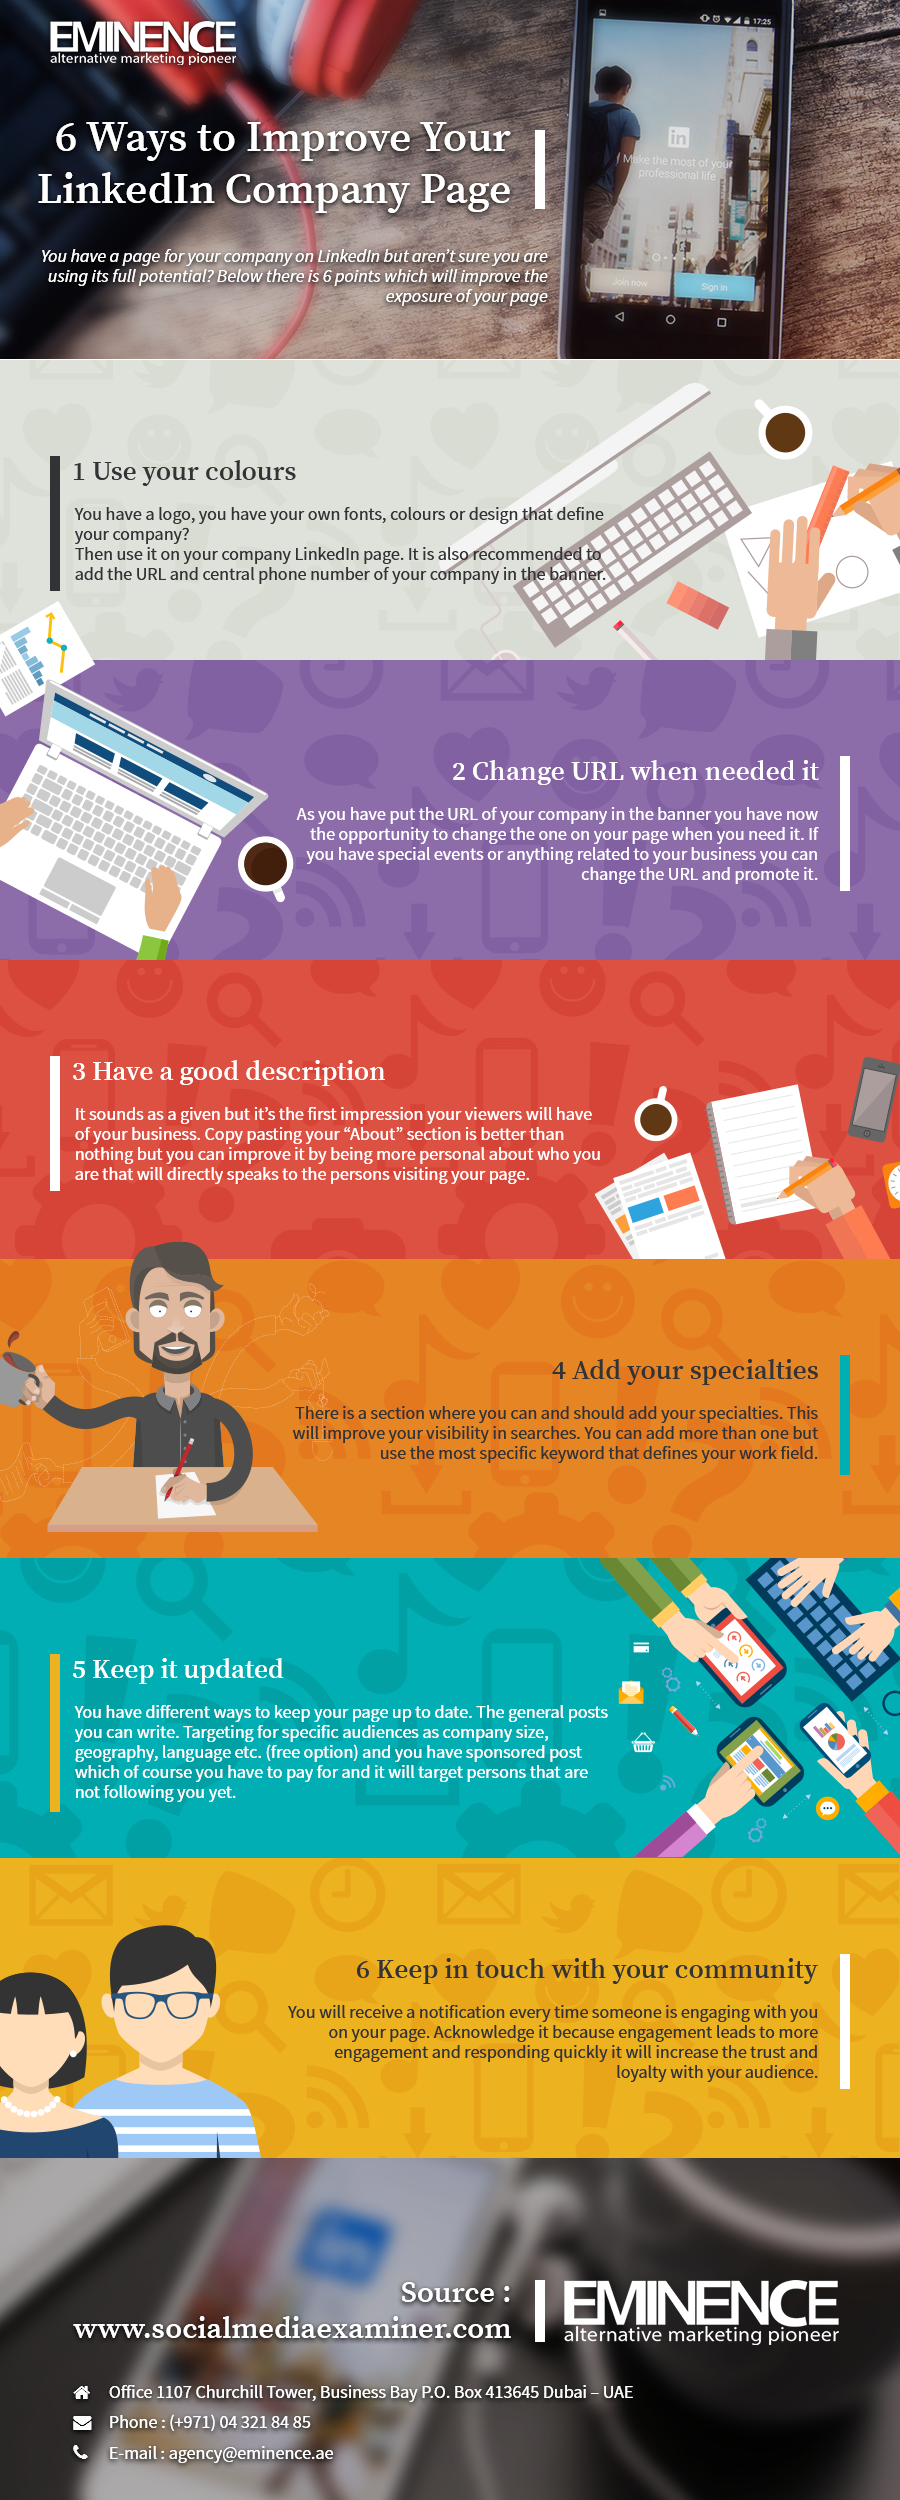 6 Ways to Improve Your LinkedIn Company Page